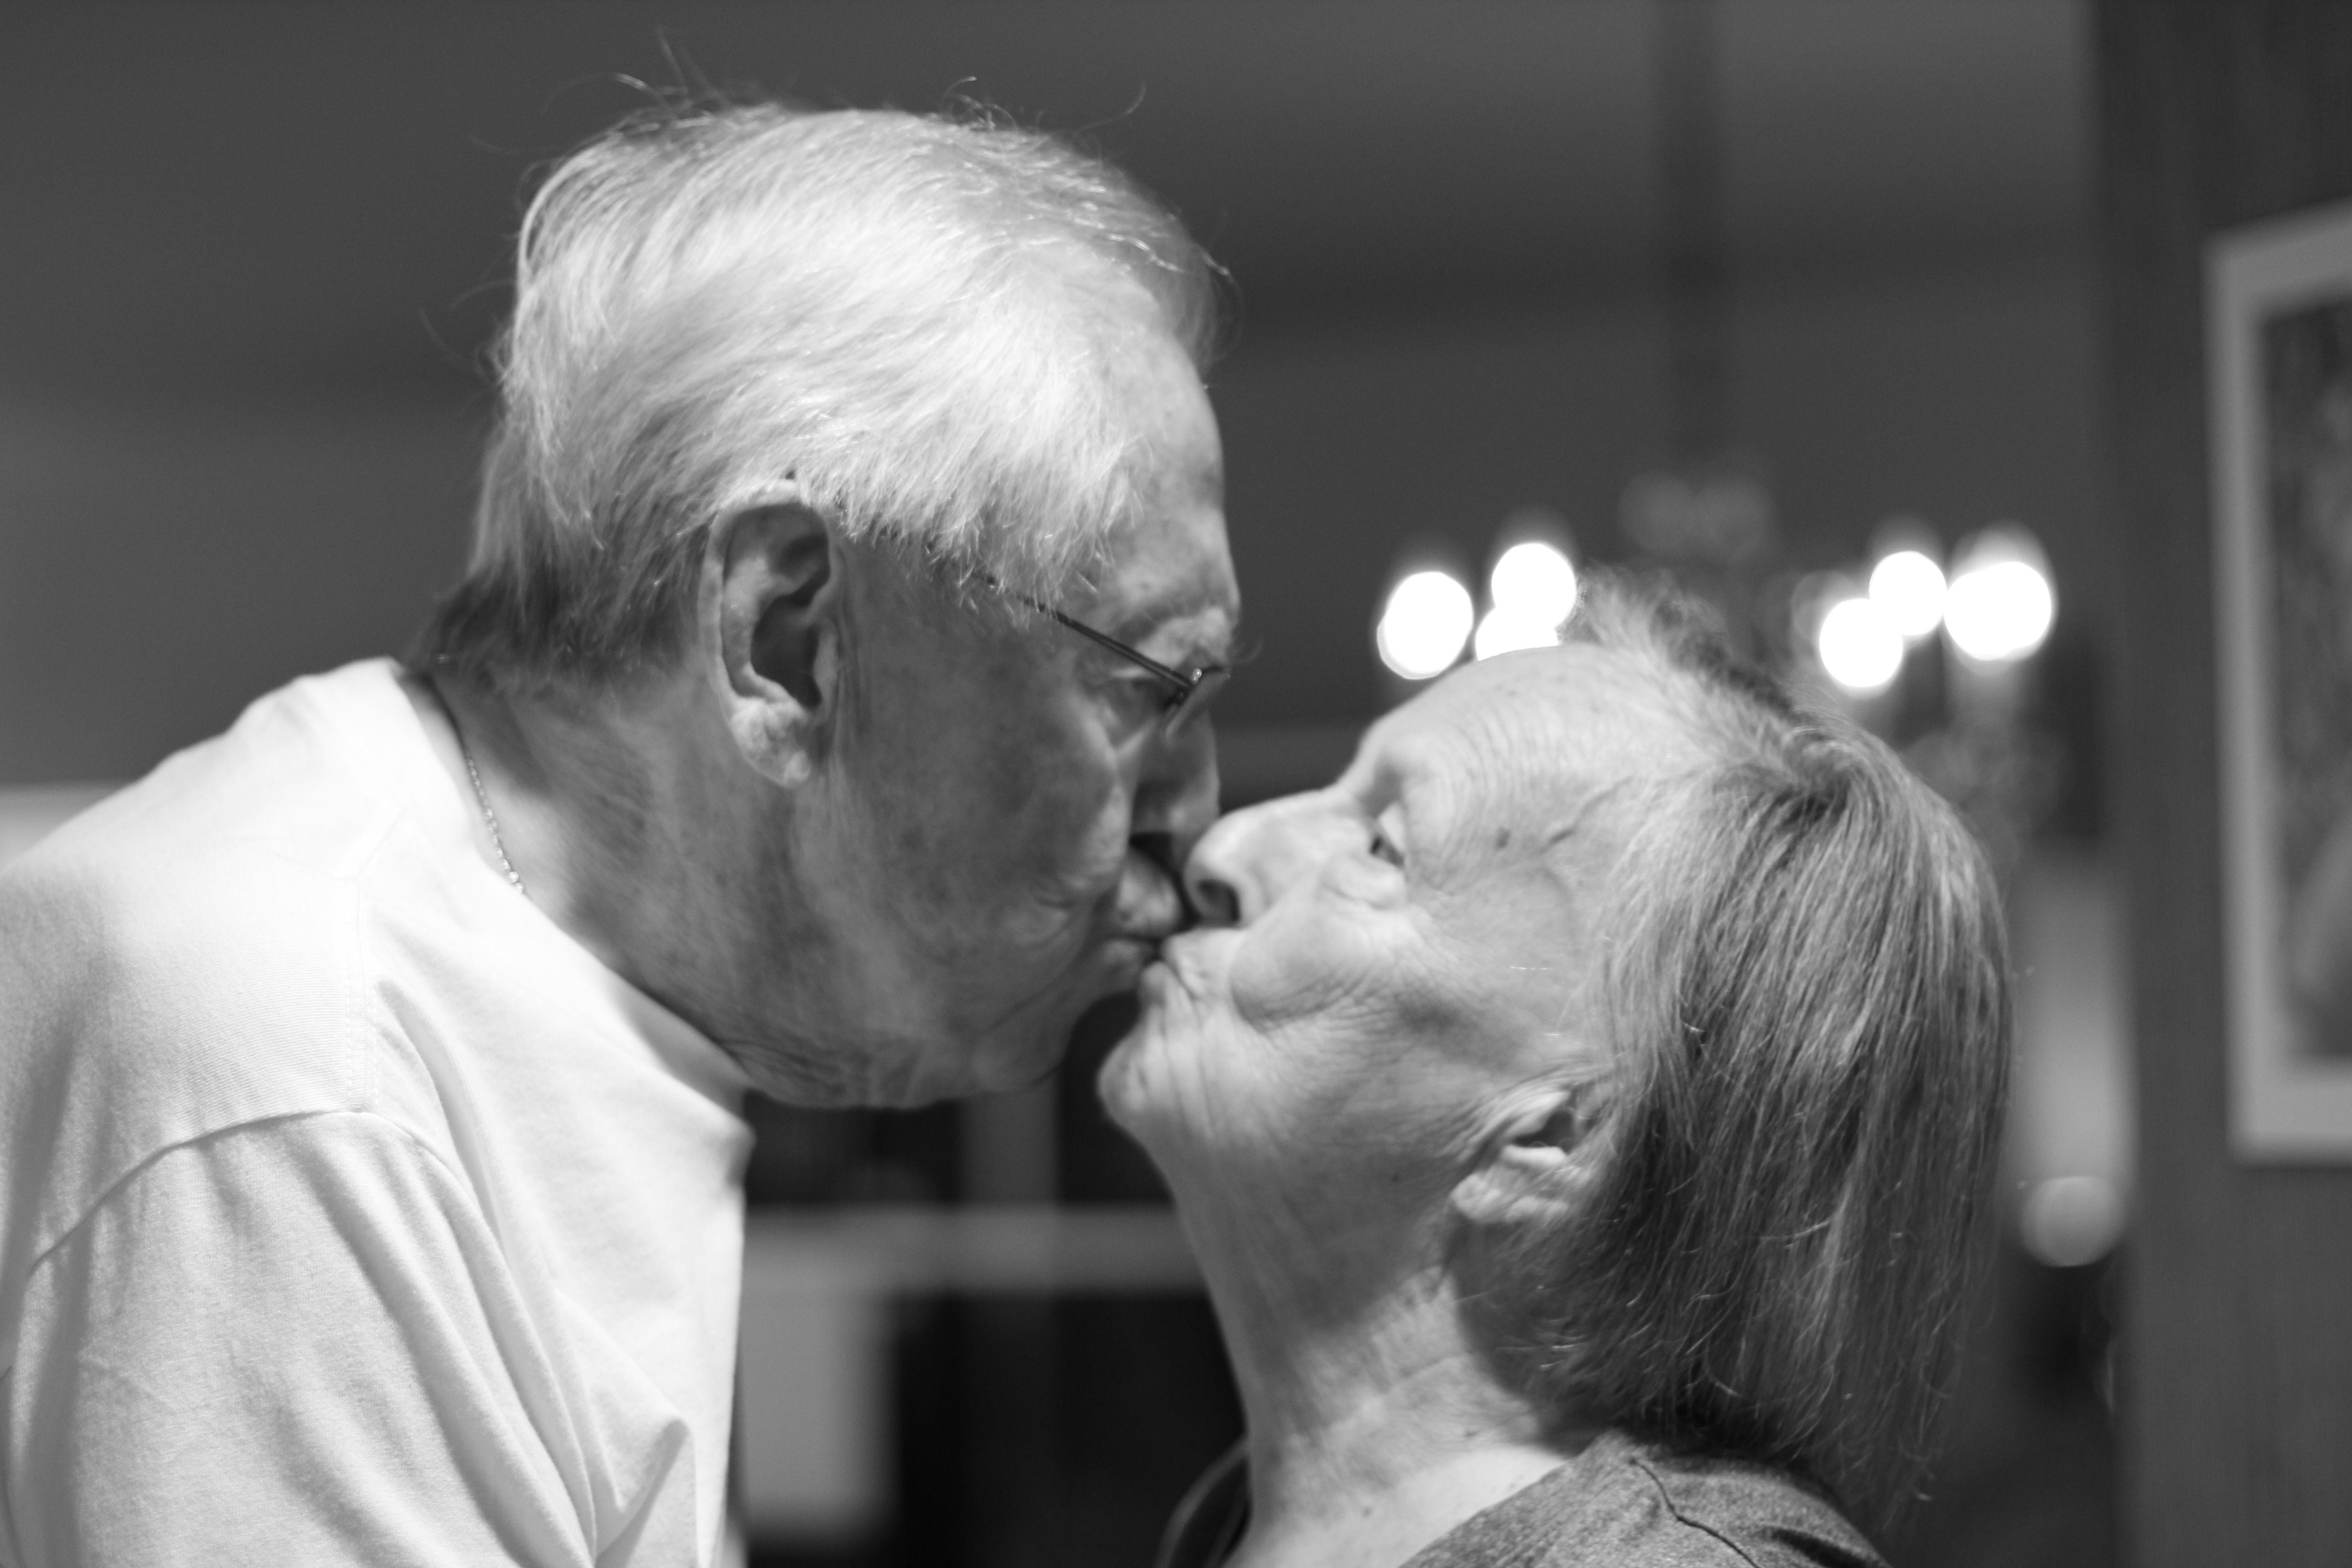 Couple Qui S Embrasse old couple kissing / vieux couple qui s'embrasse | inspiring images